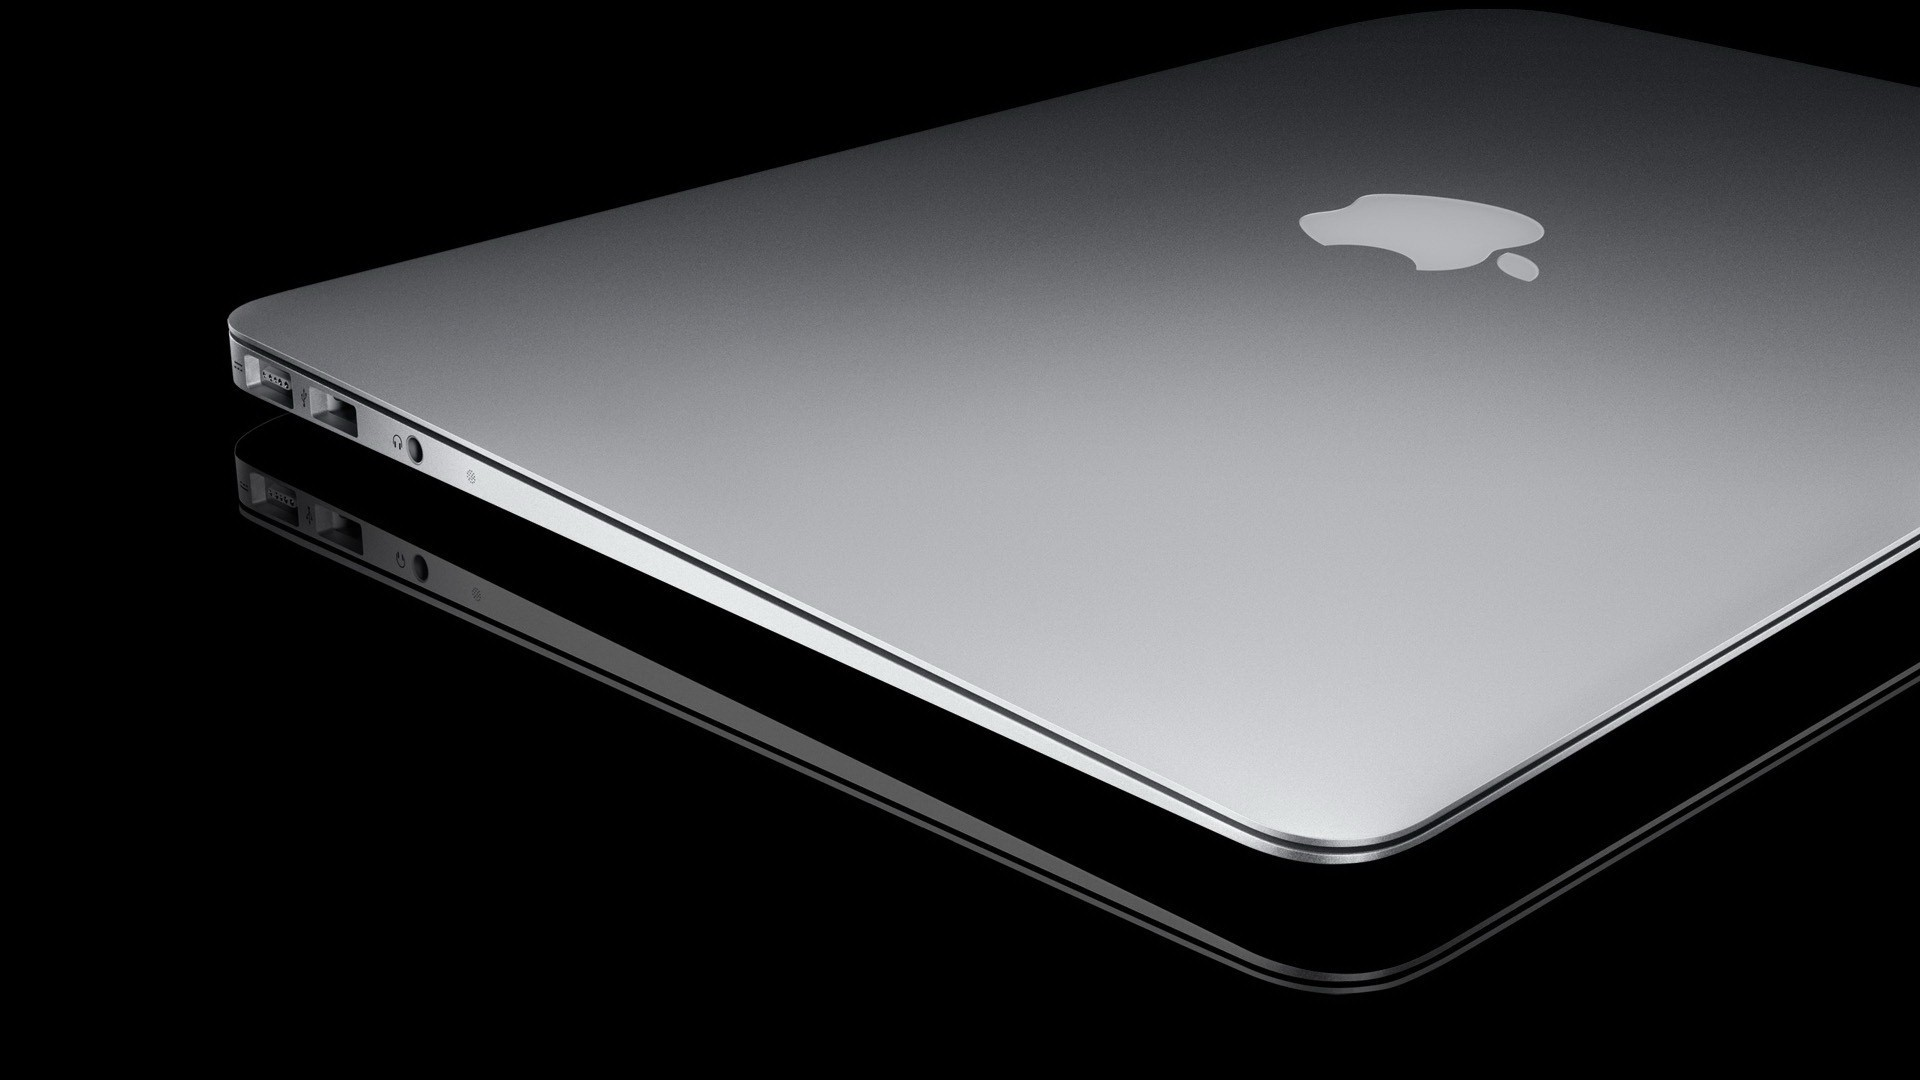 Apple_Laptop_High_Definiton_Computer_Desktop_Background_Images